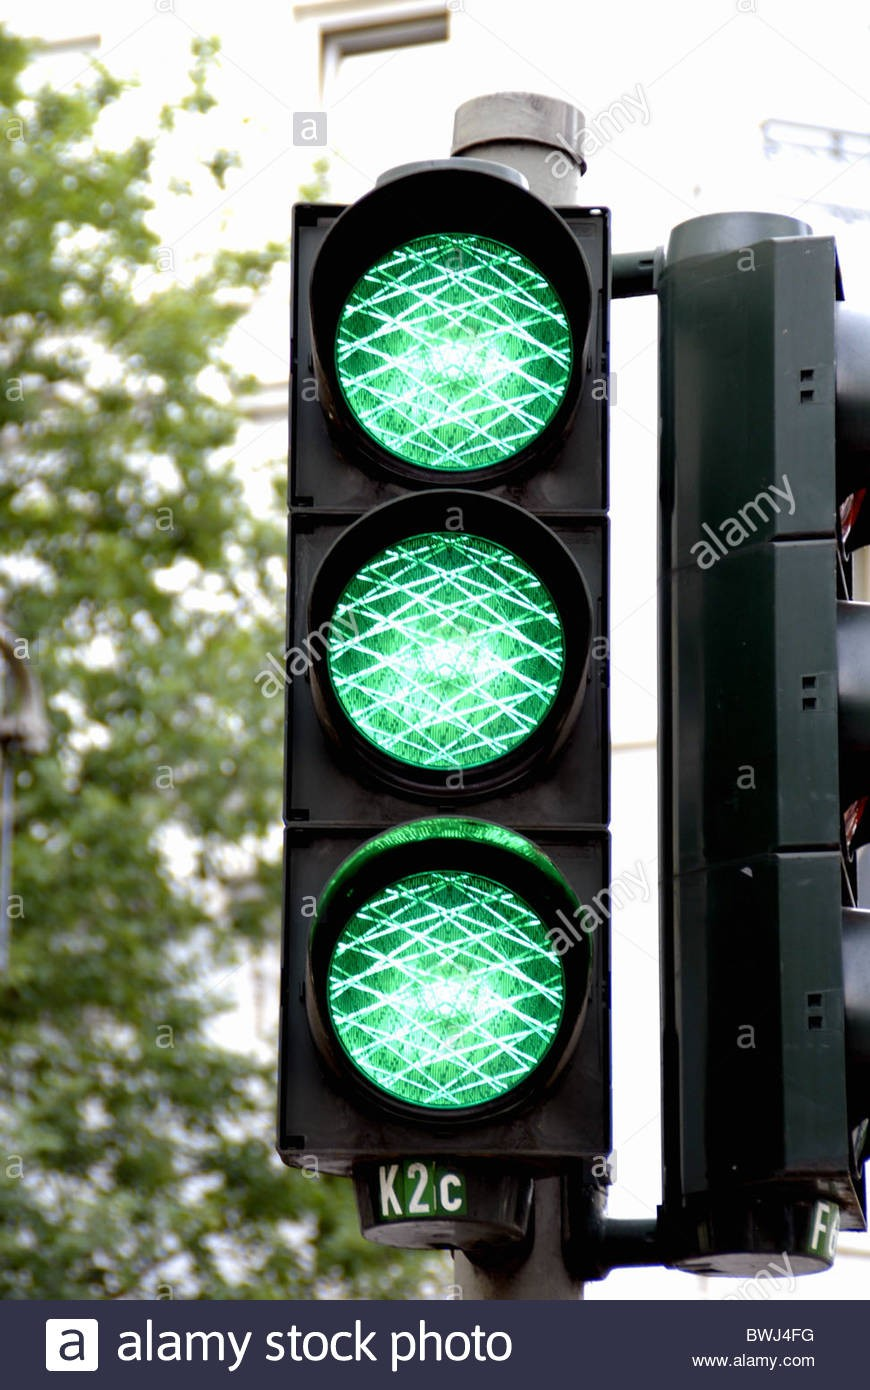 traffic-light-light-signal-green-free-free-journey-drive-bwj4fg.jpg